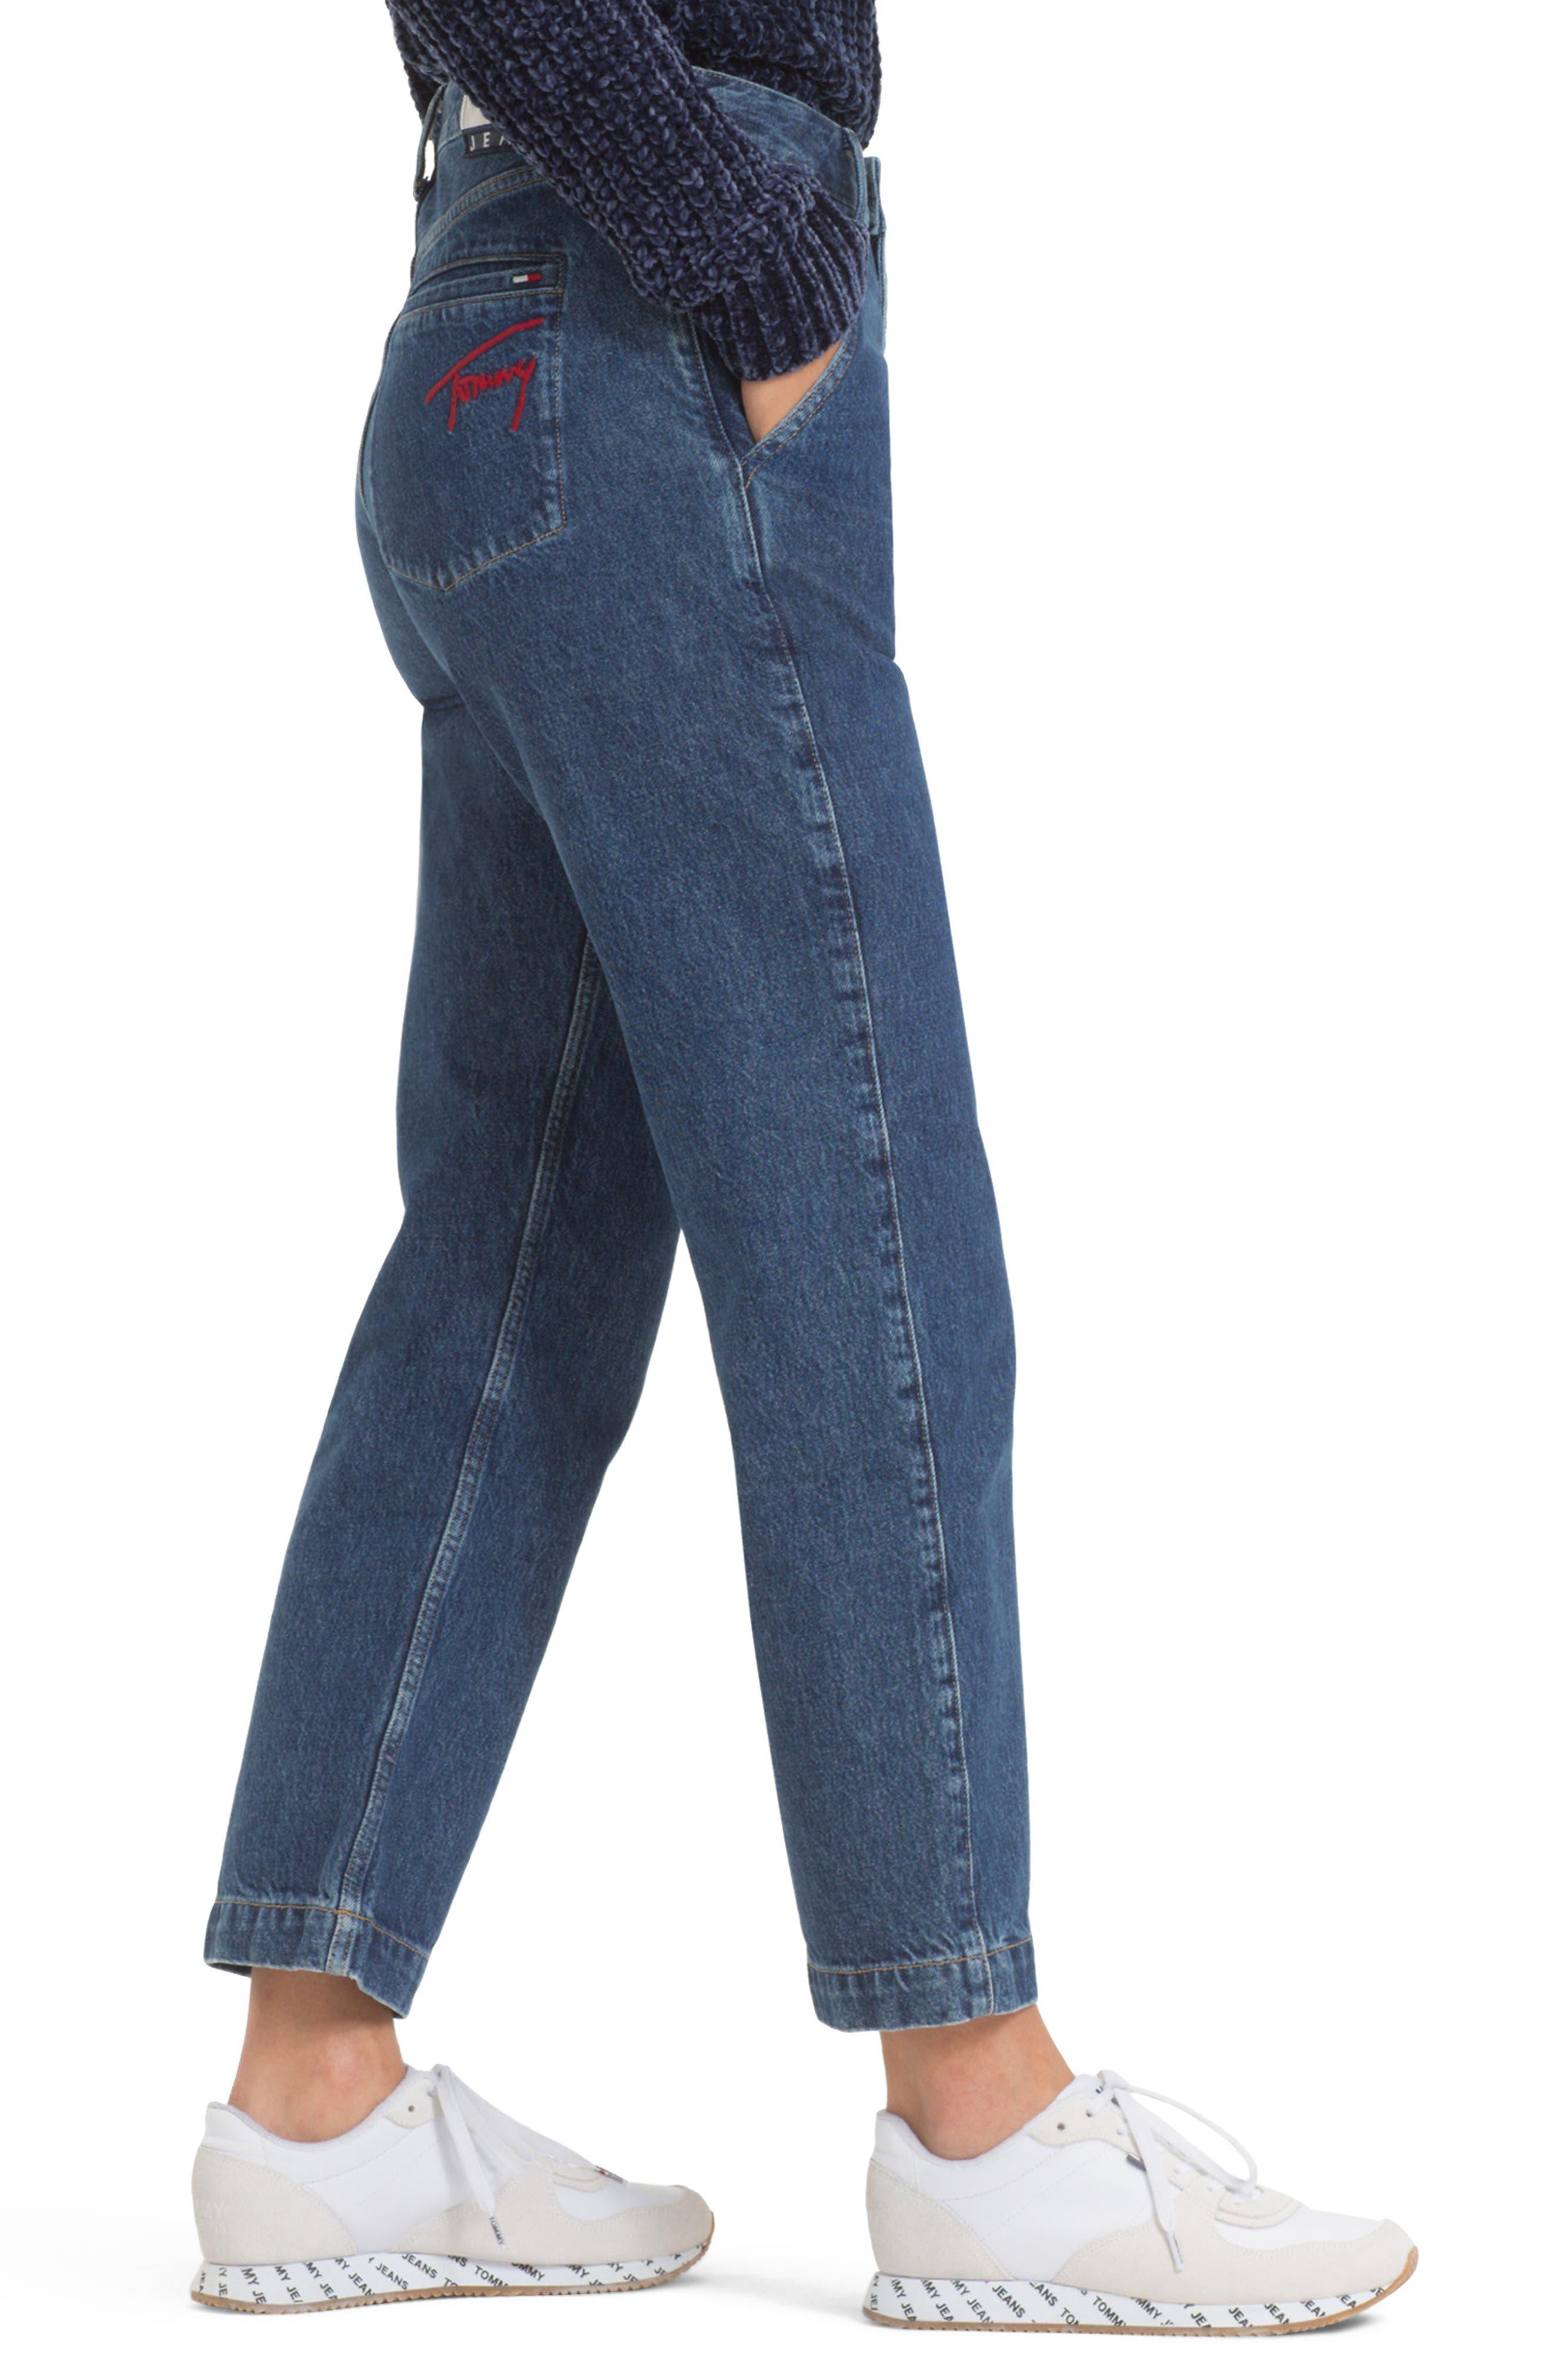 TOMMY JEANS, TJW Straight Leg Jeans, Alternate thumbnail 4, color, 400